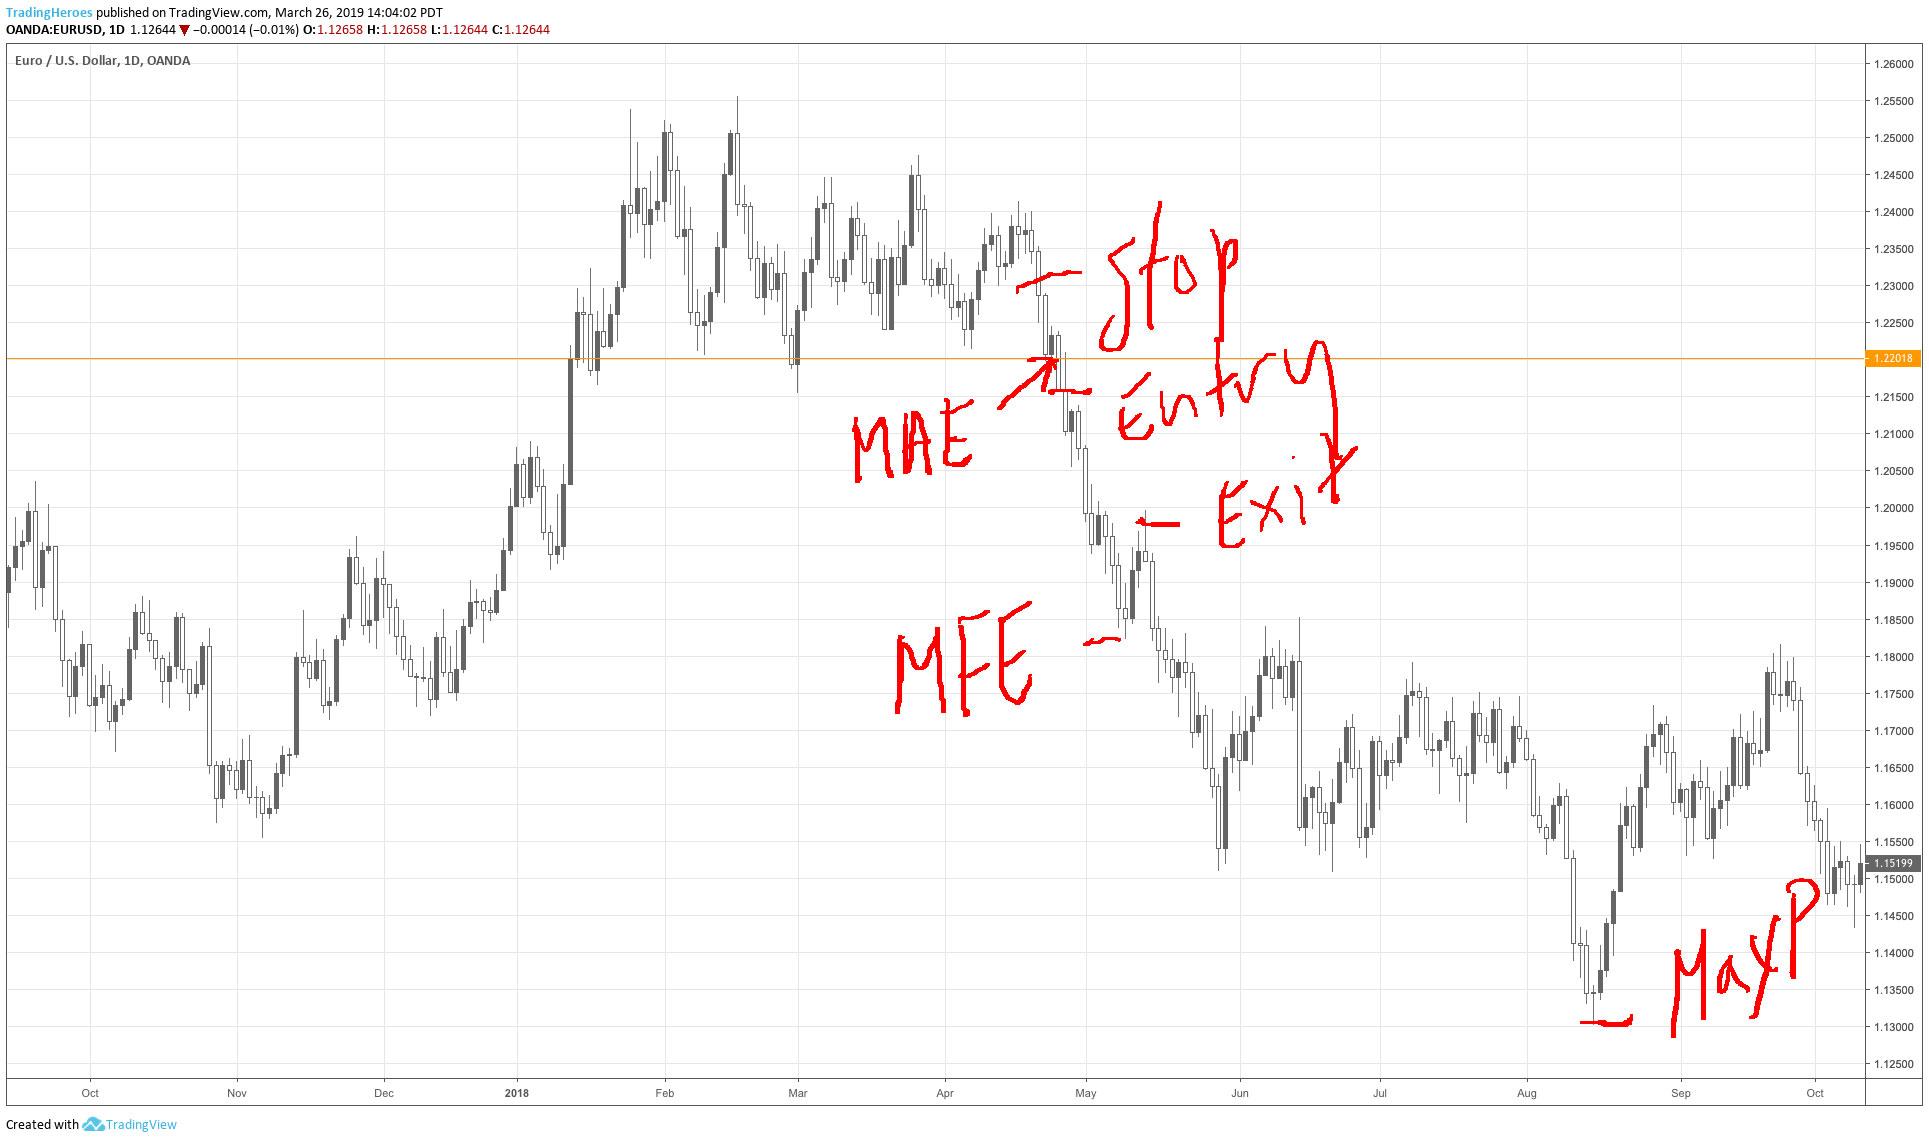 MFE and MAE on a chart